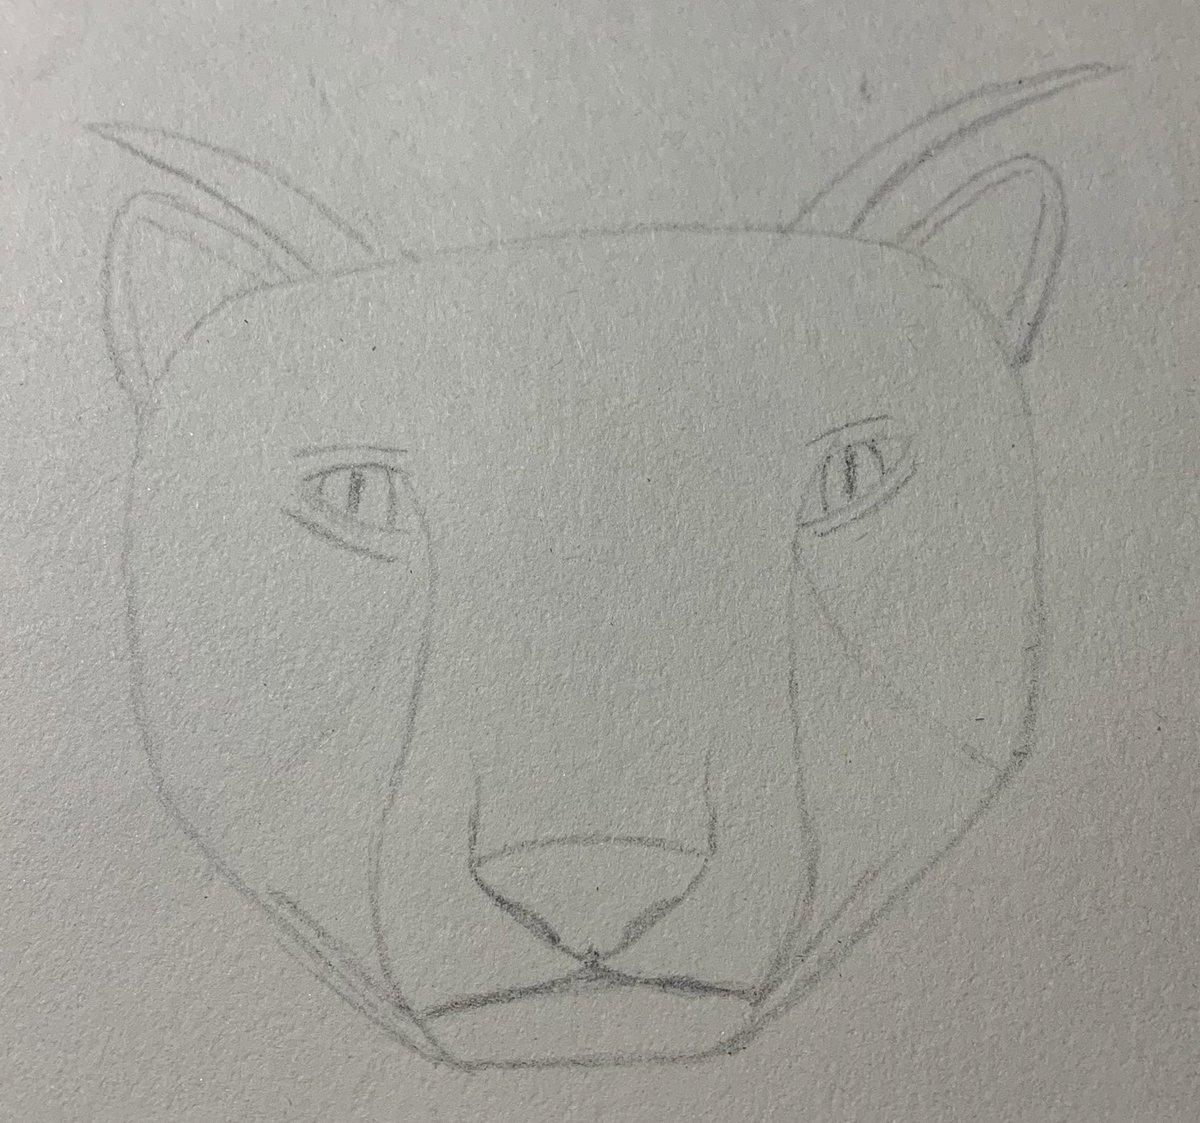 Fursona loading (it's gonna be a demon leopard with a fro-hawk)  #drawingwhileblack #fursofcolor #beginnerartists https://t.co/lUtBKZo48e